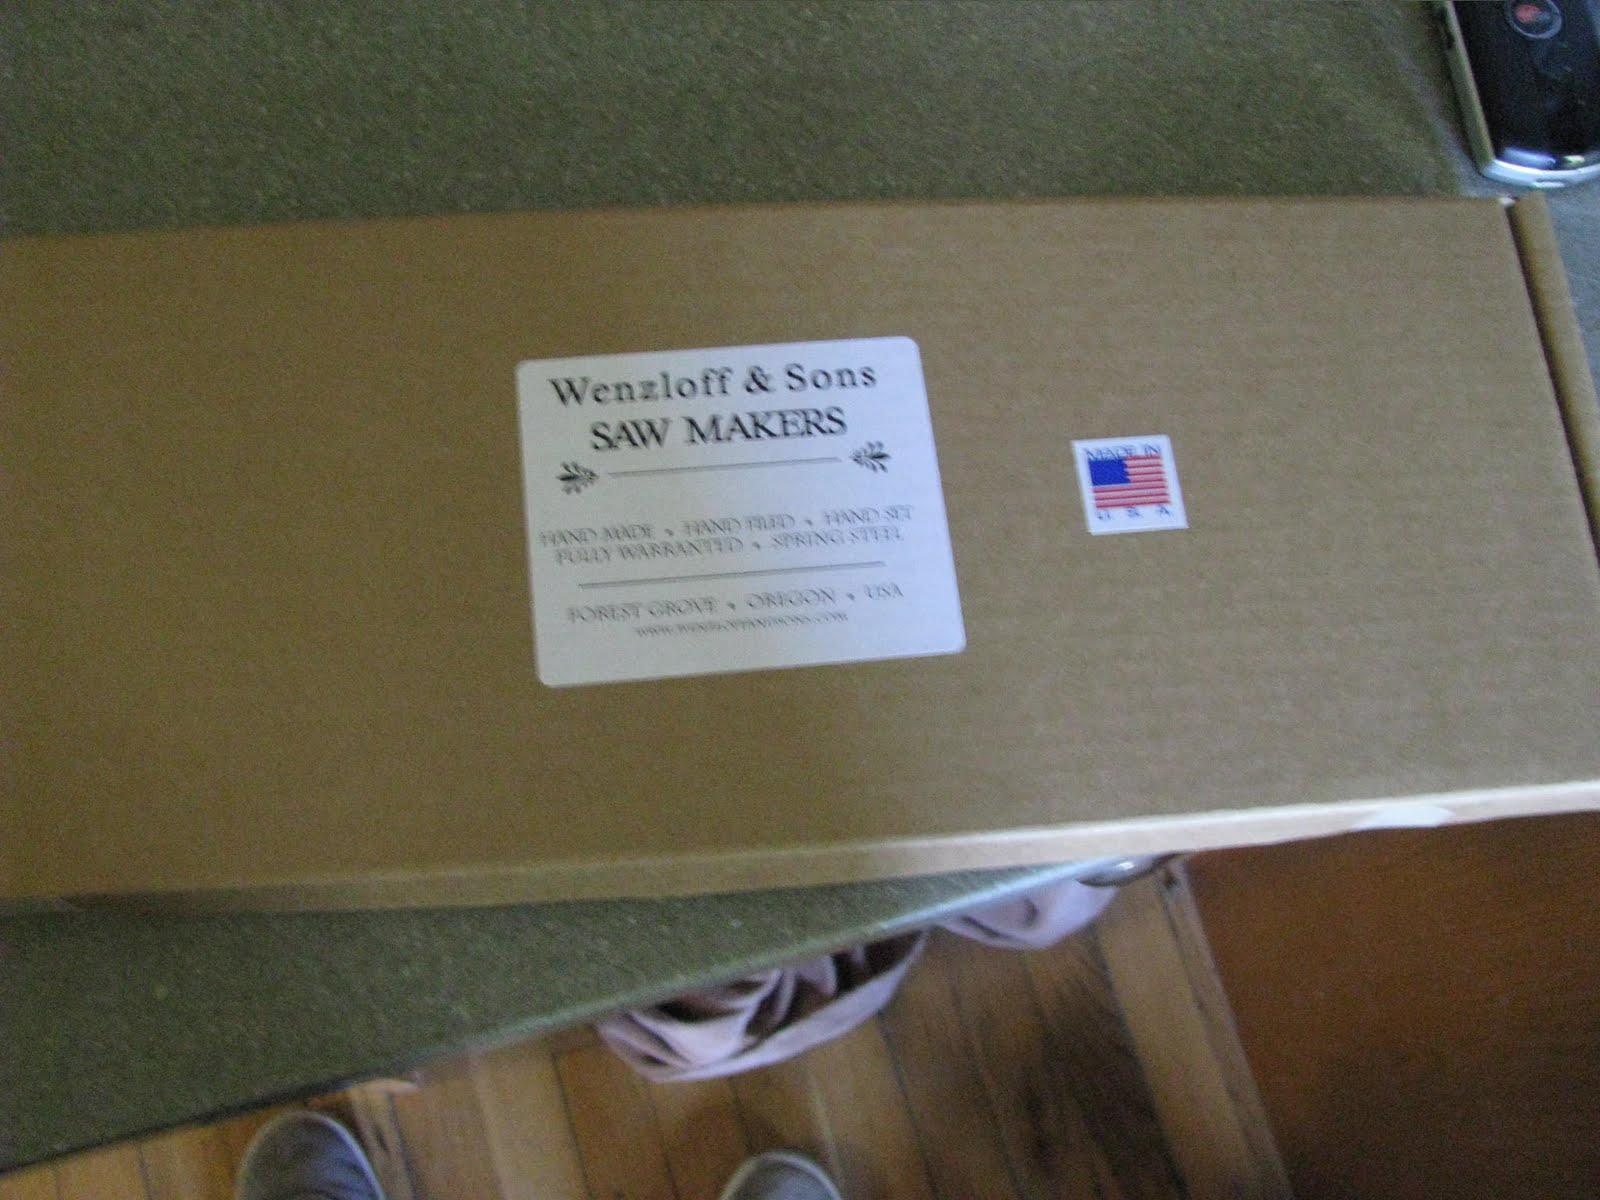 Wenzloff Sons